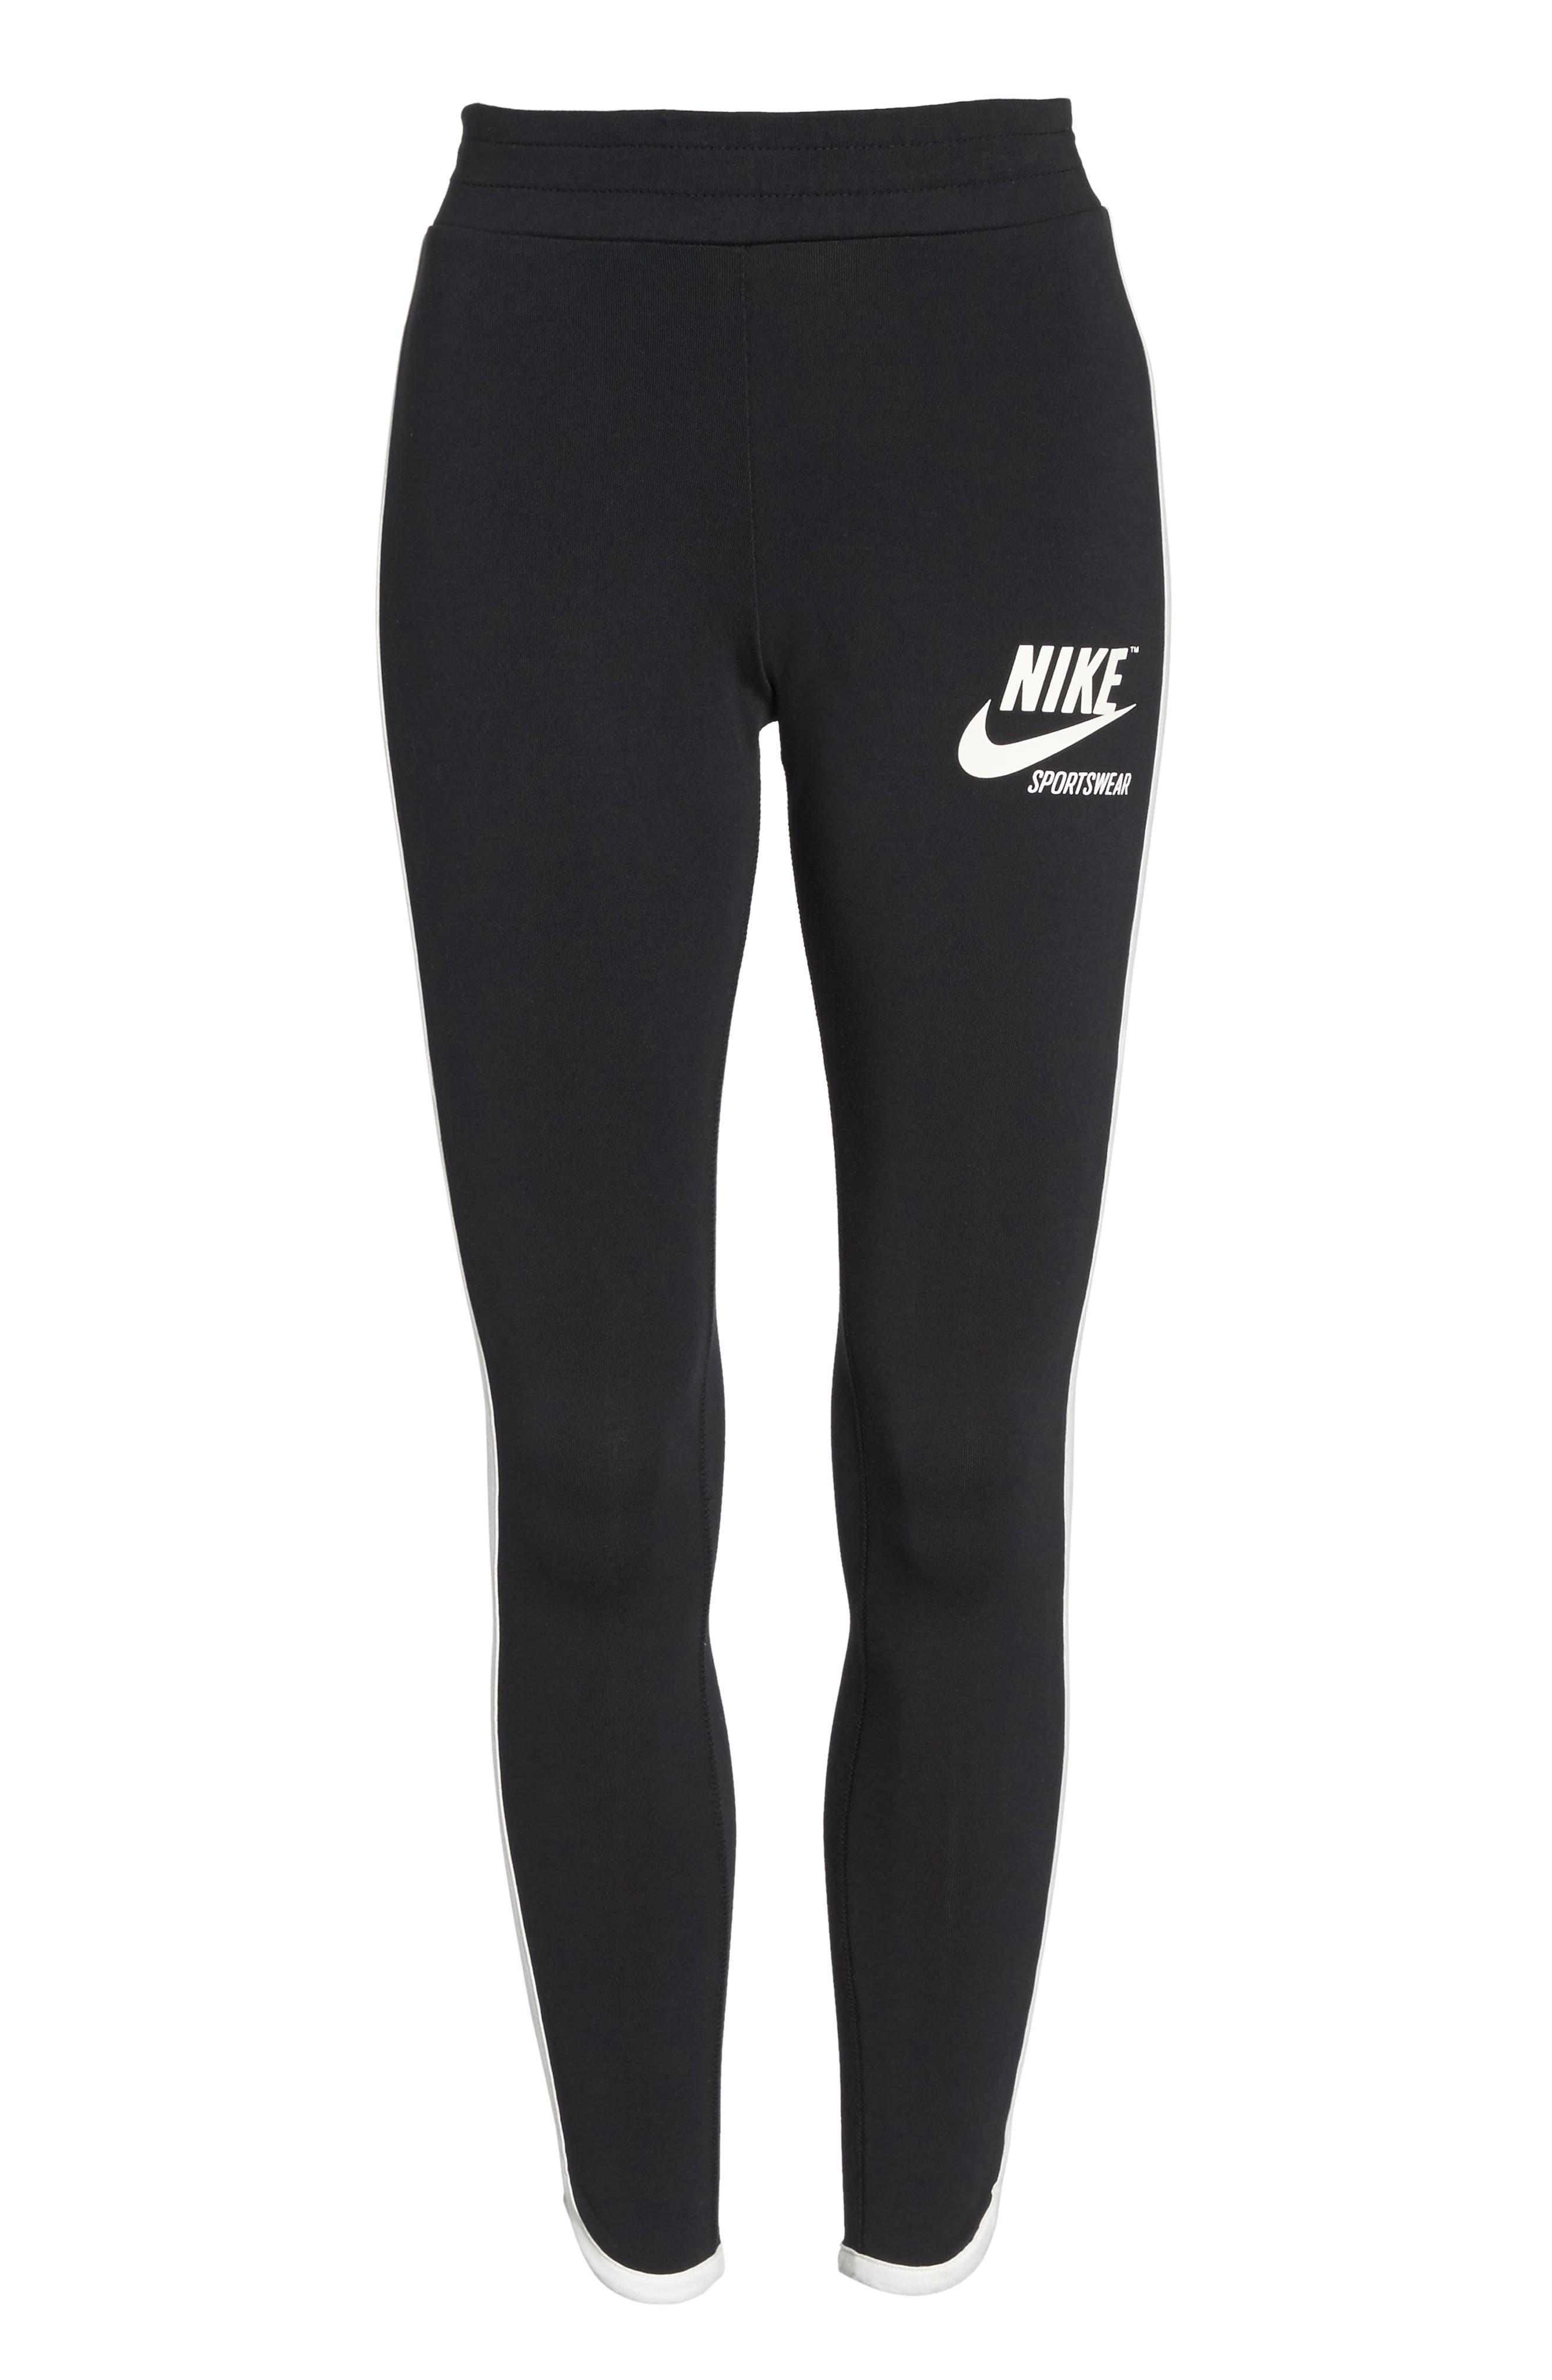 Sportswear Women's Leggings,                             Alternate thumbnail 7, color,                             Black/ Sail